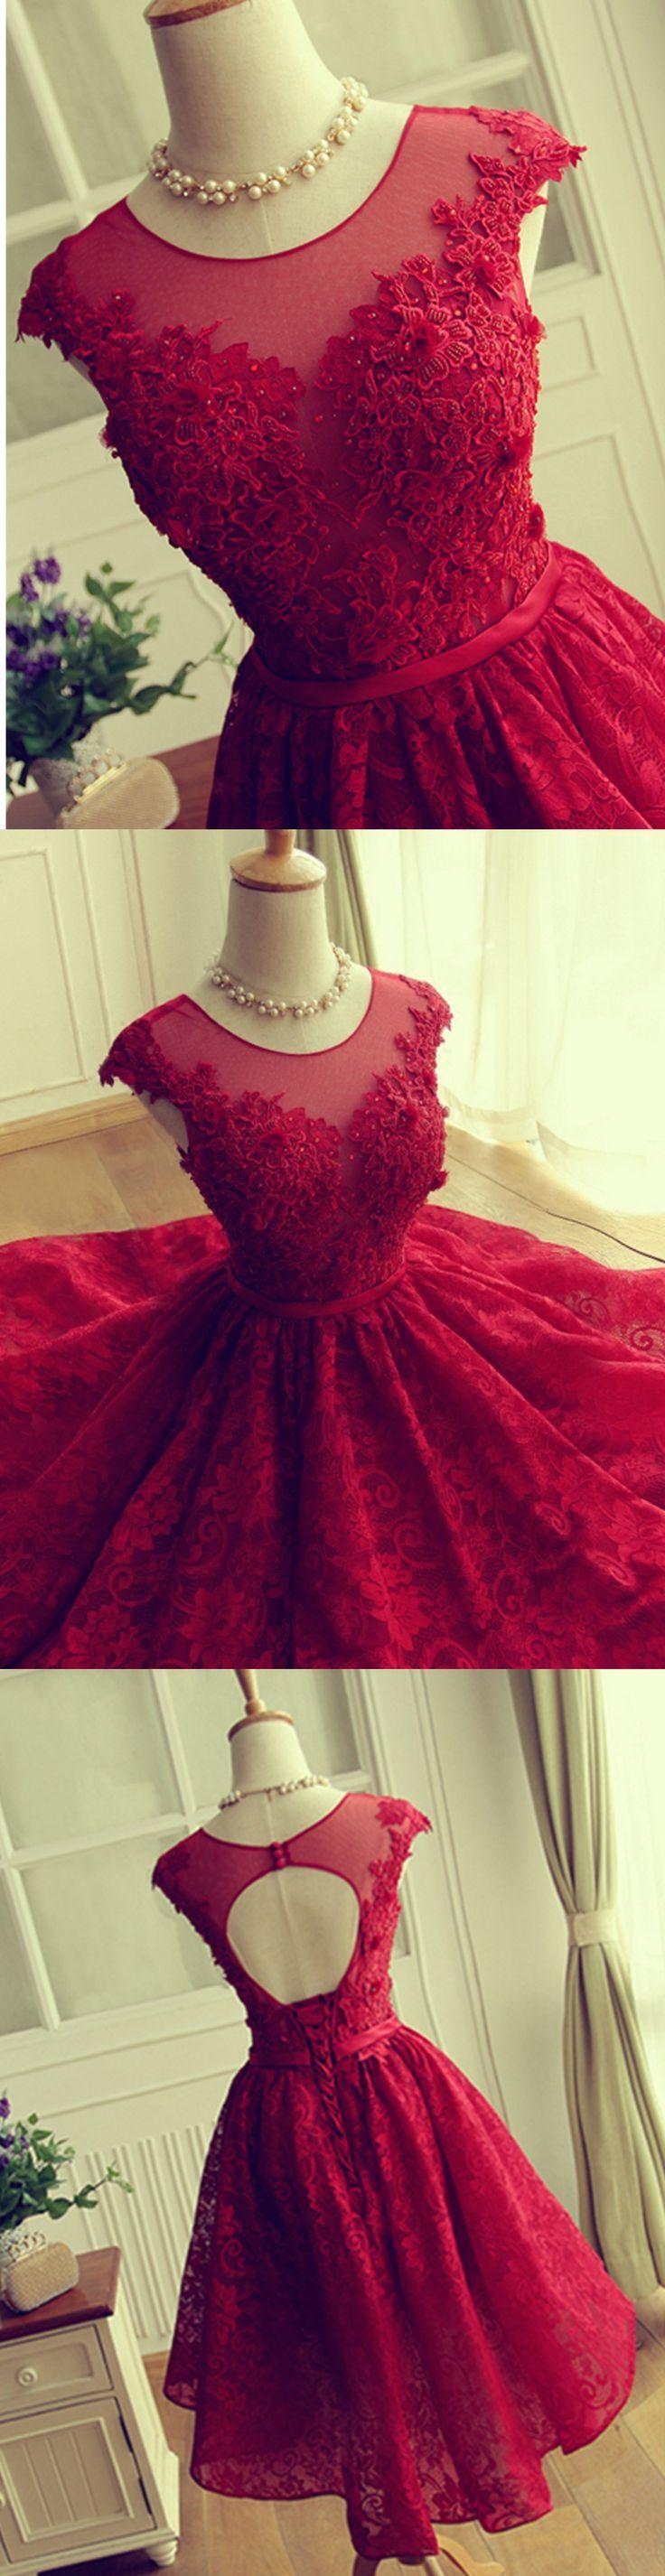 Stunning prom dressesprom maxi dress uniors dresses